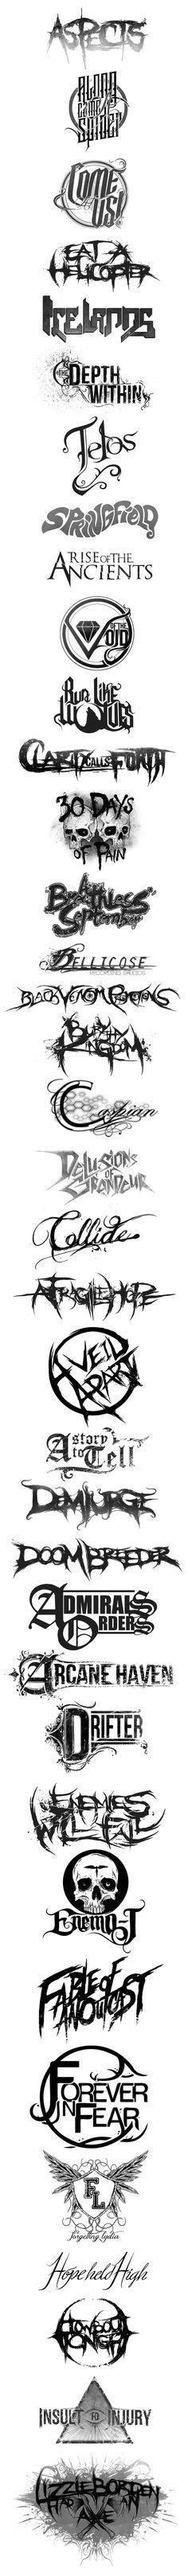 Band logo's (part 1) on Behance